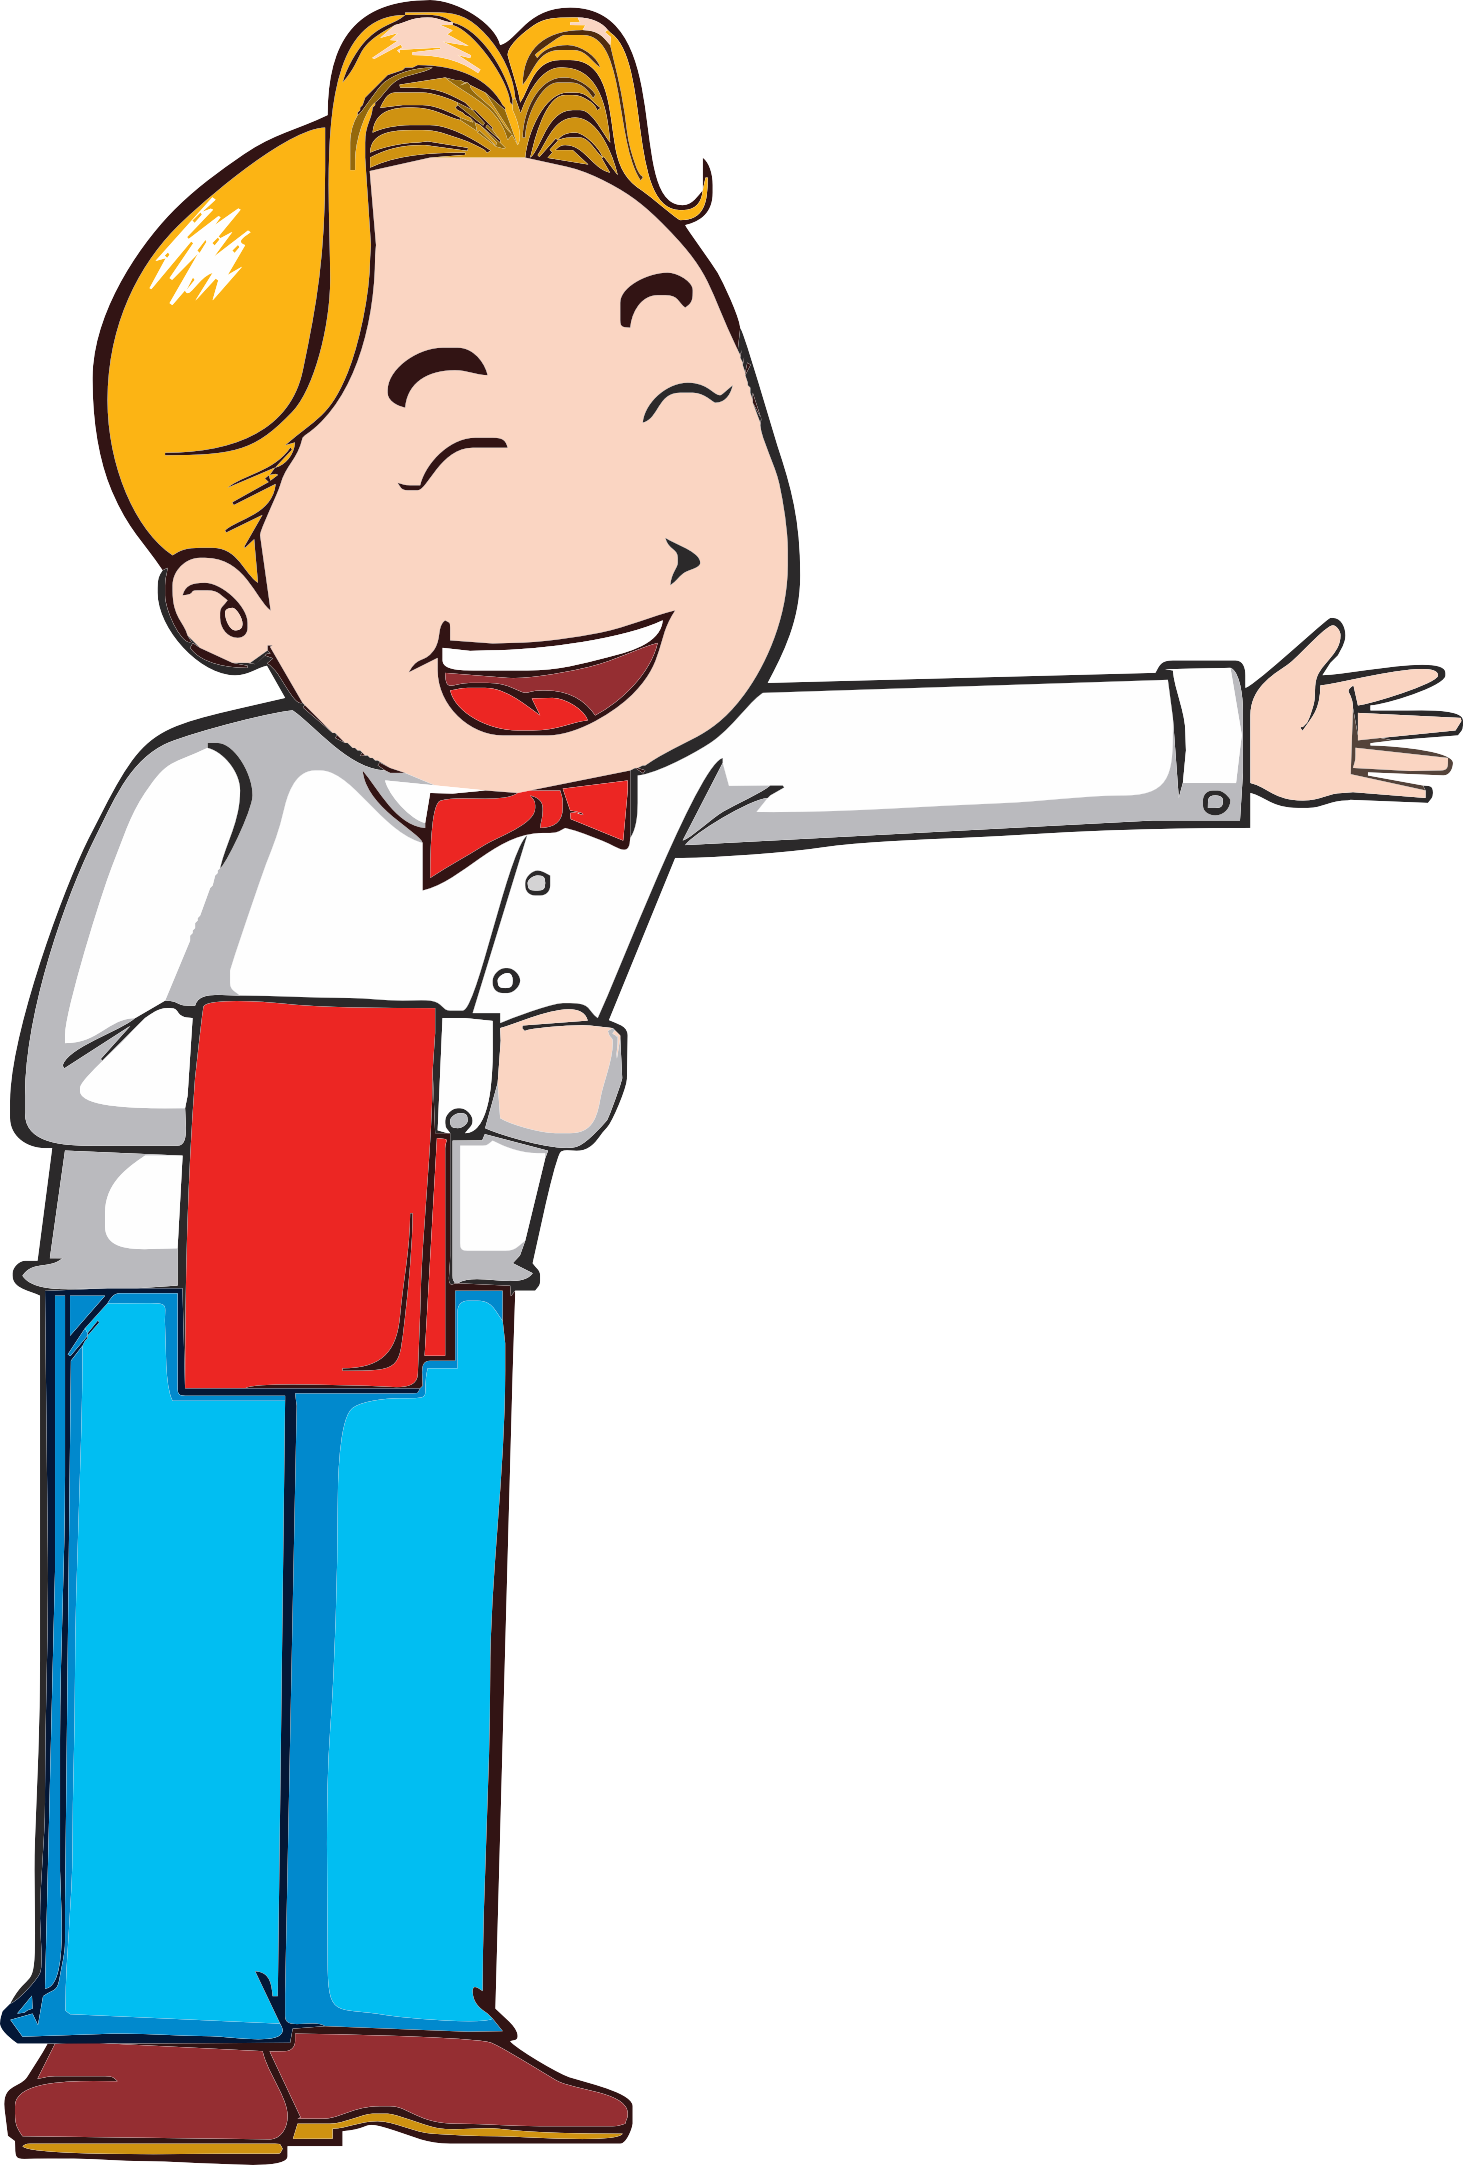 picture freeuse stock Restaurants clipart. Waiter download clip art.